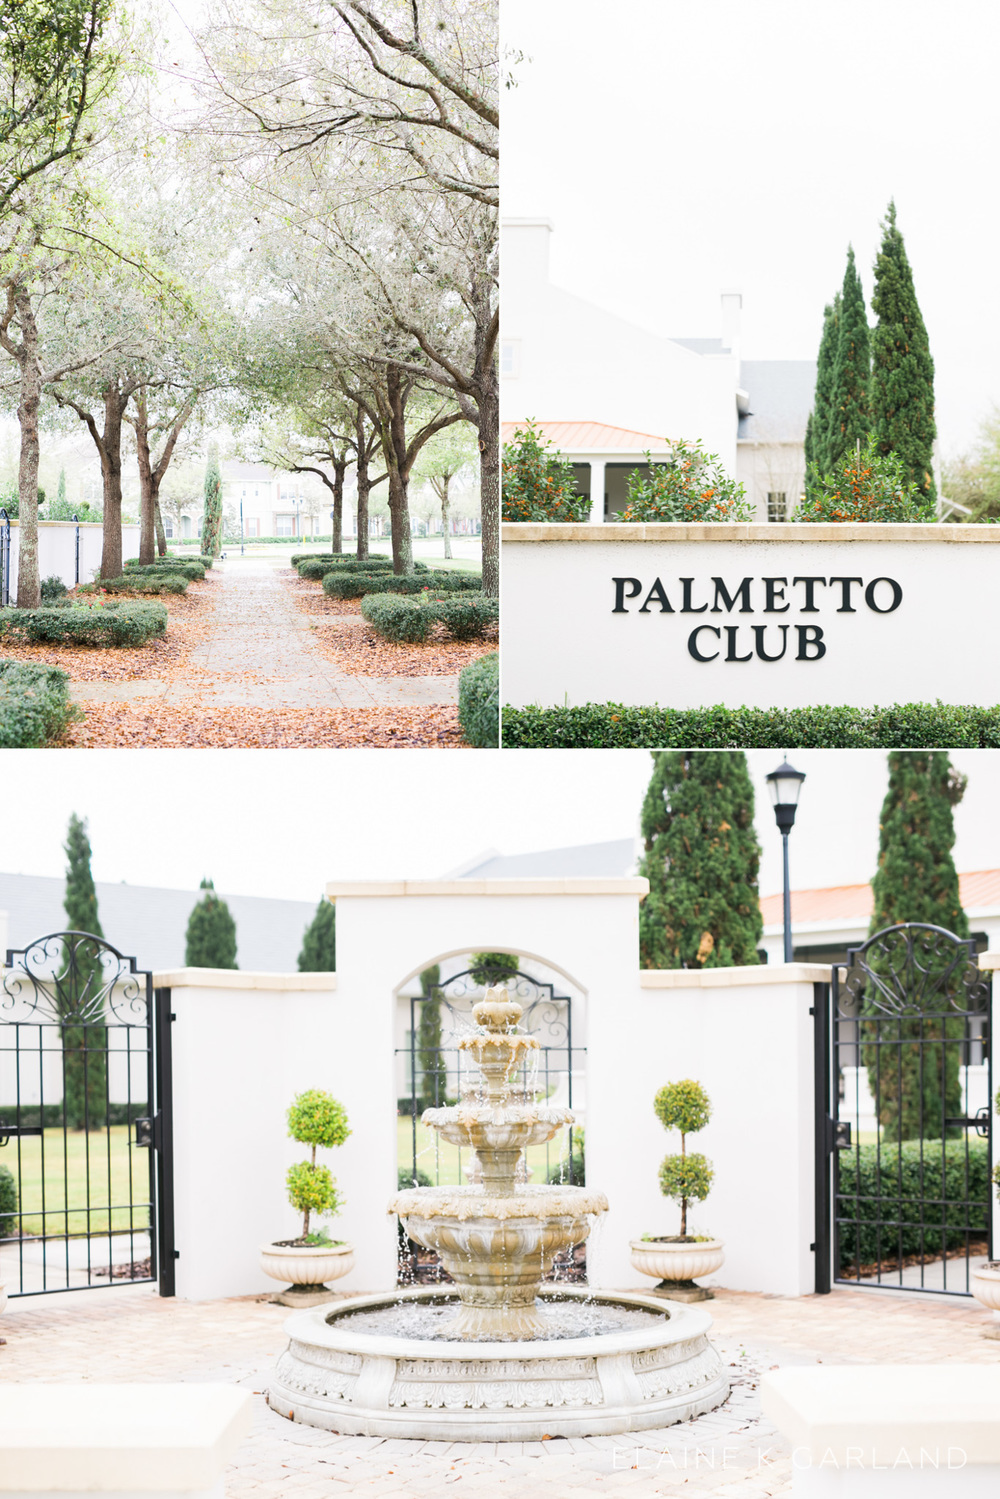 the-palmetto-club-at-fishhawk-ranch-wedding-1.jpg